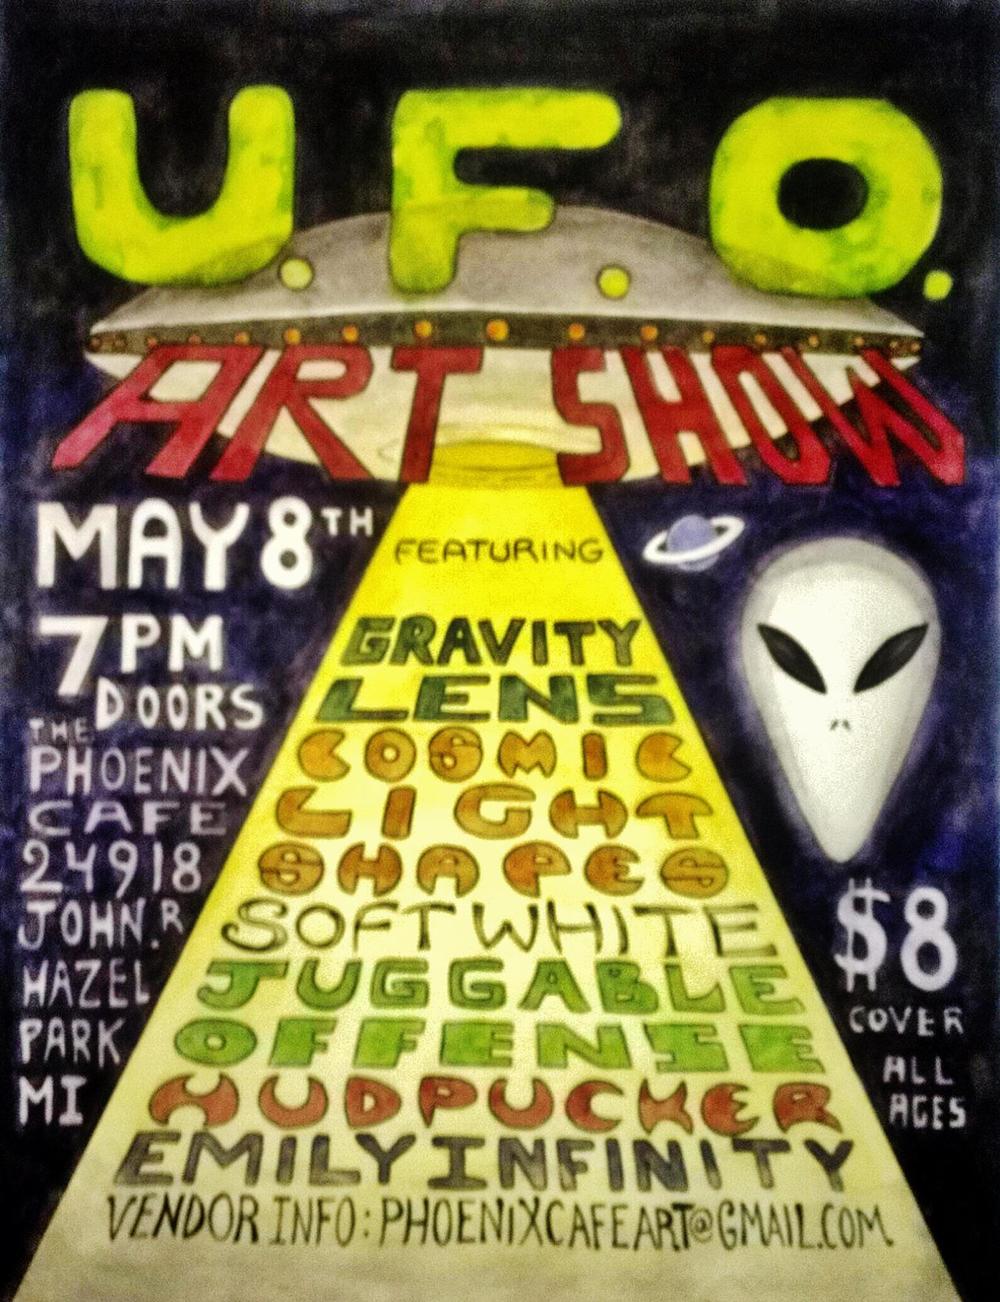 UFO , Phoenix Cafe, 2015, Hazel Park MI